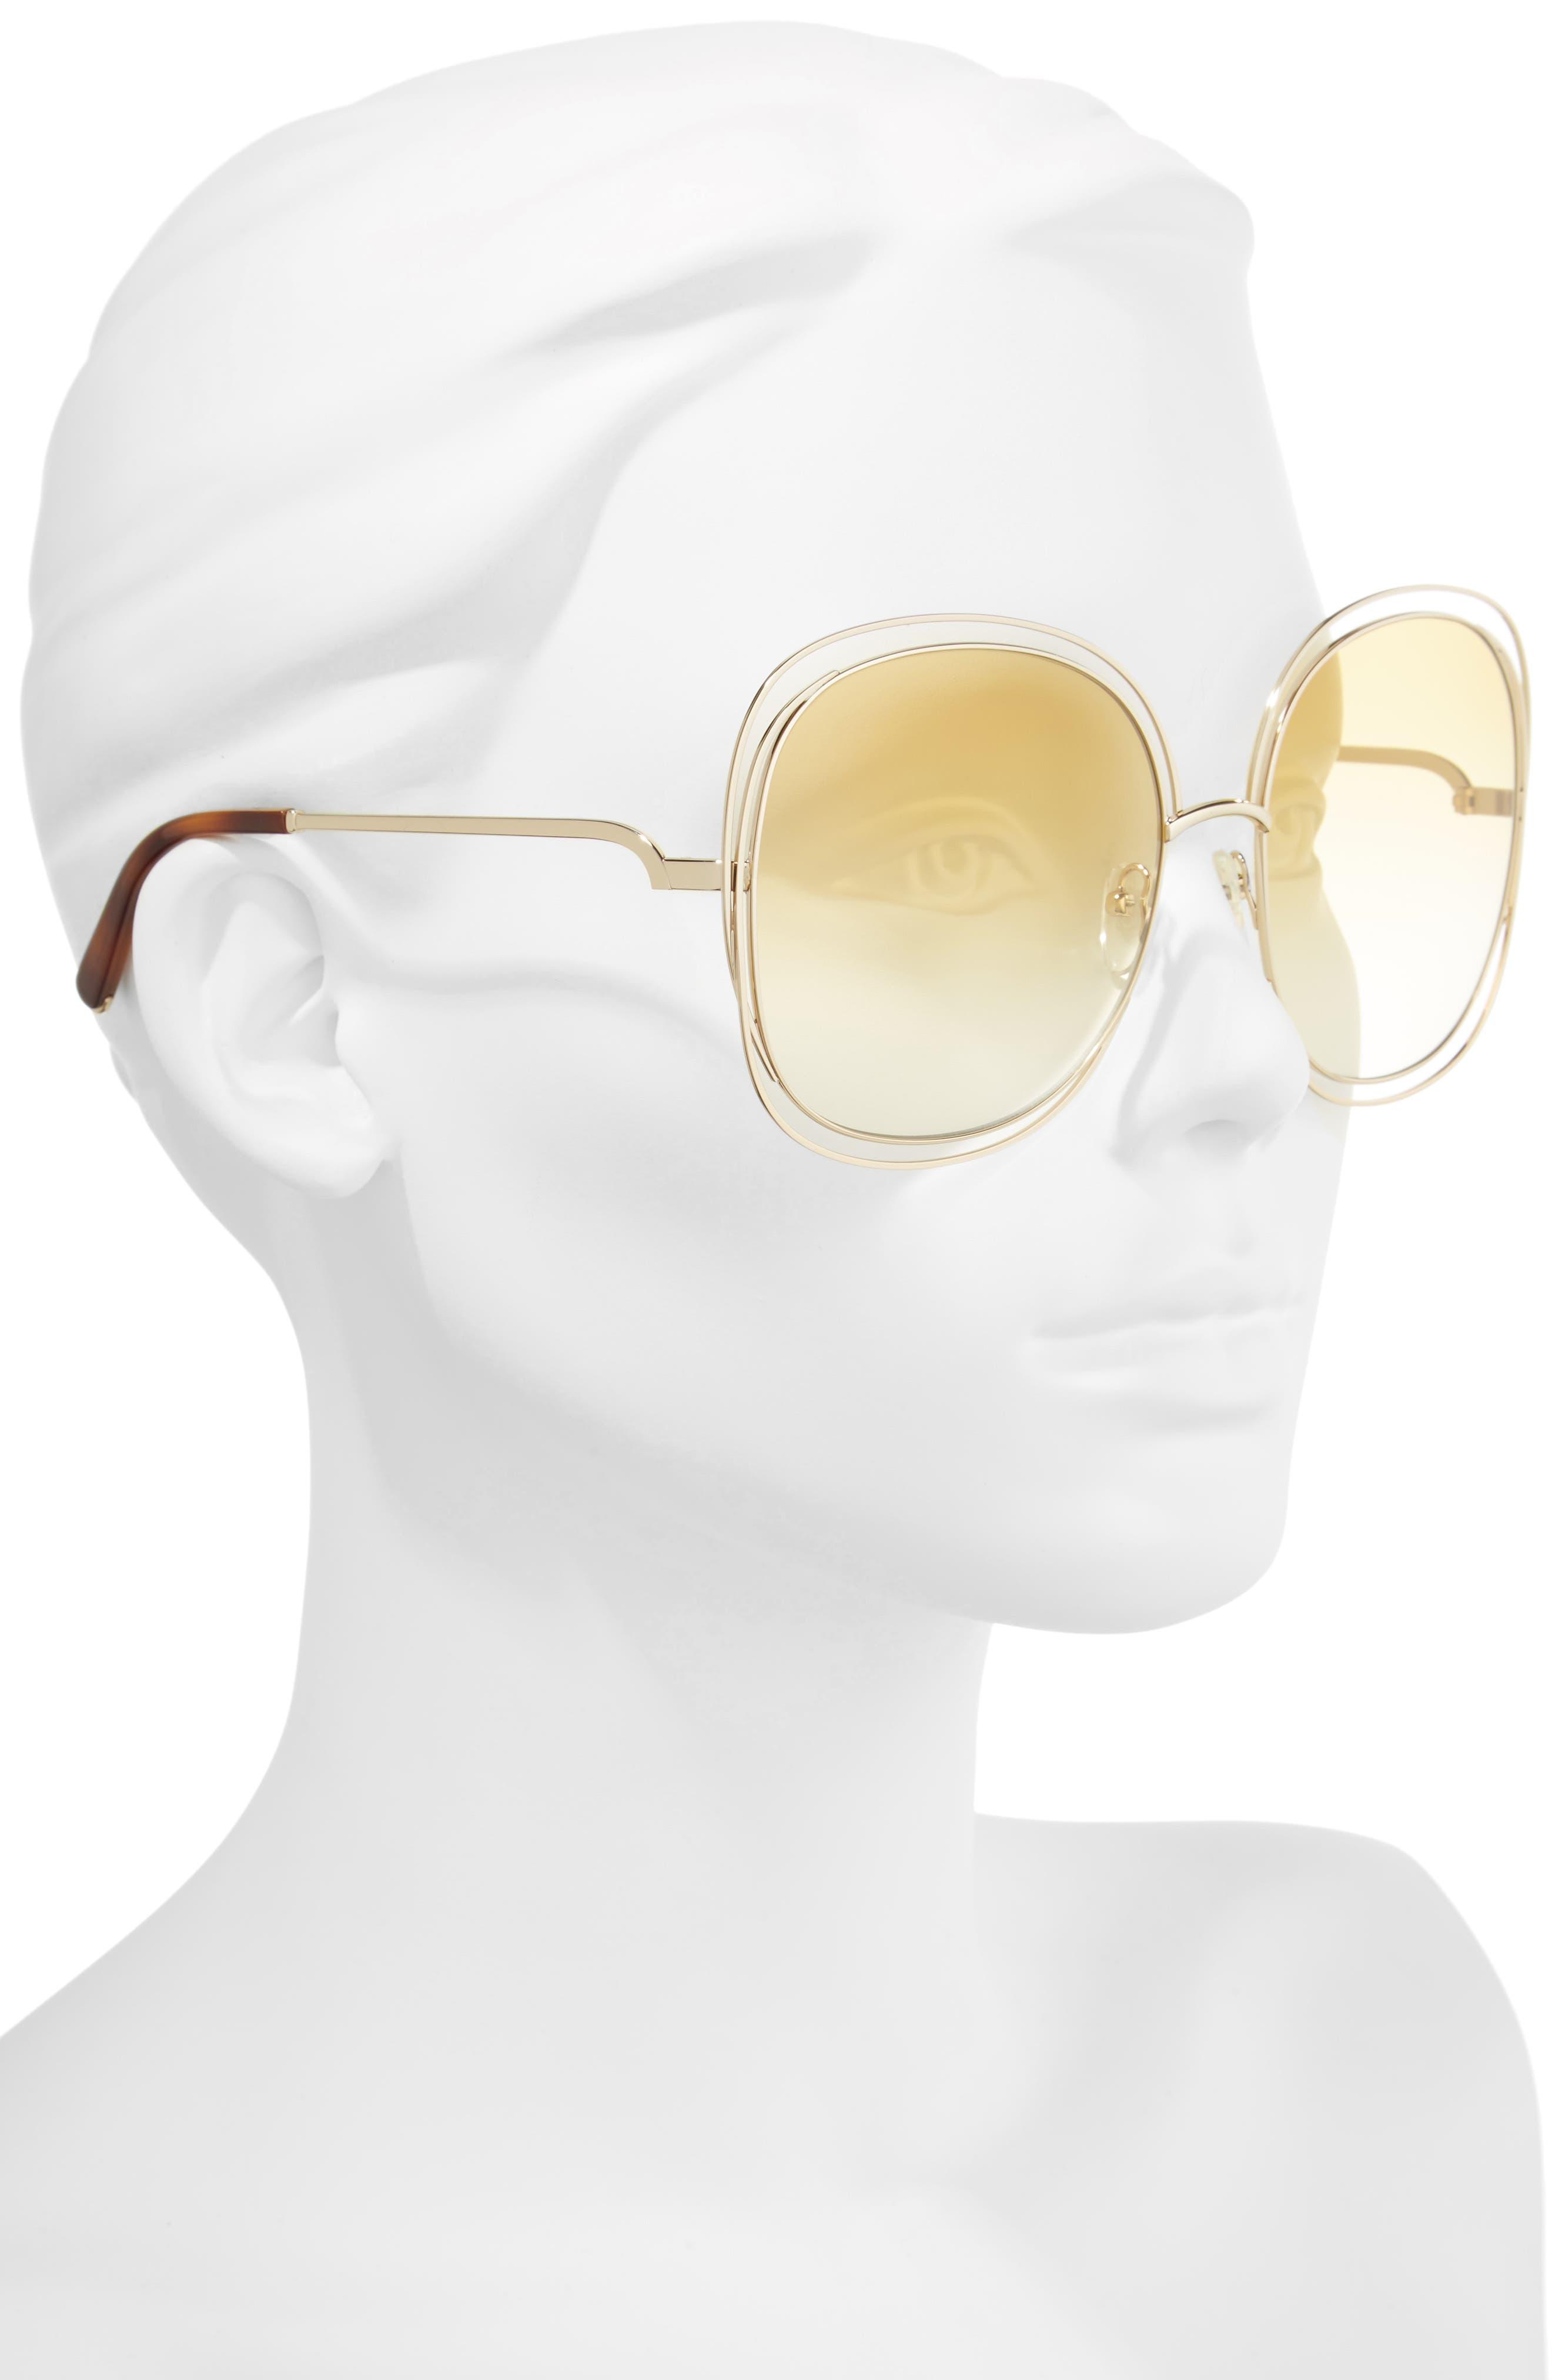 Carlina 62mm Oversize Sunglasses,                             Alternate thumbnail 2, color,                             714